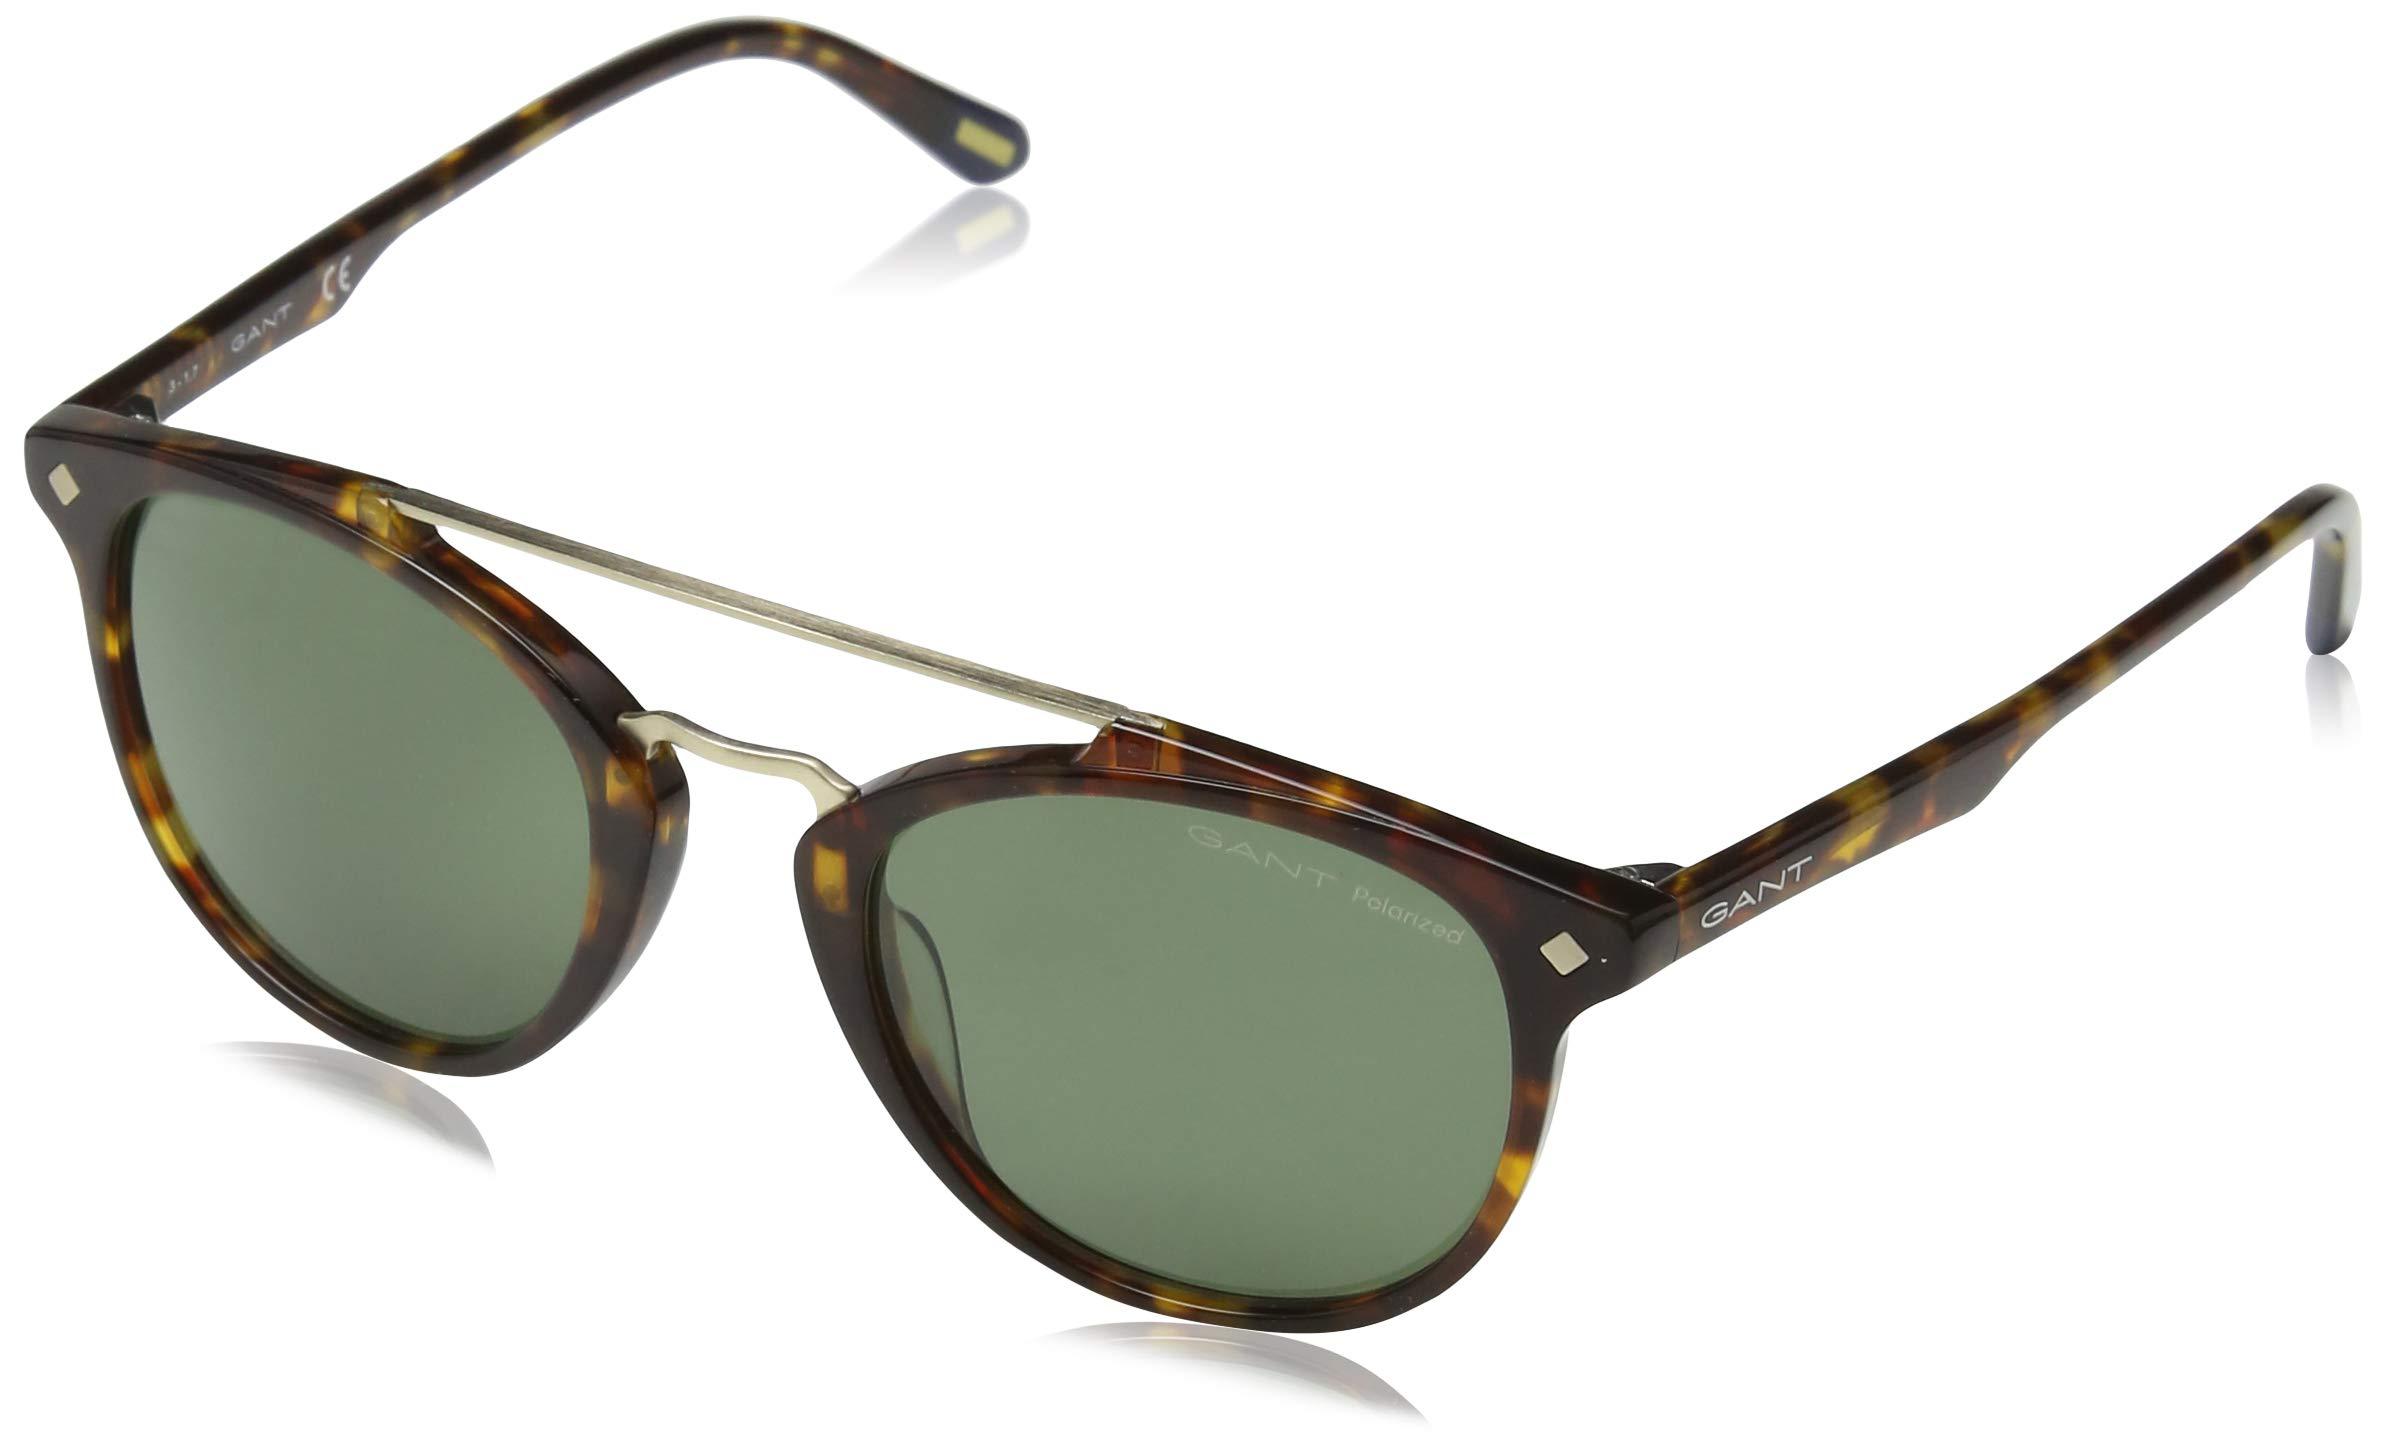 Gant Sunglasses LunettesMarronbraunHomme 49 52r De Ga7087 Montures sCthrQxd